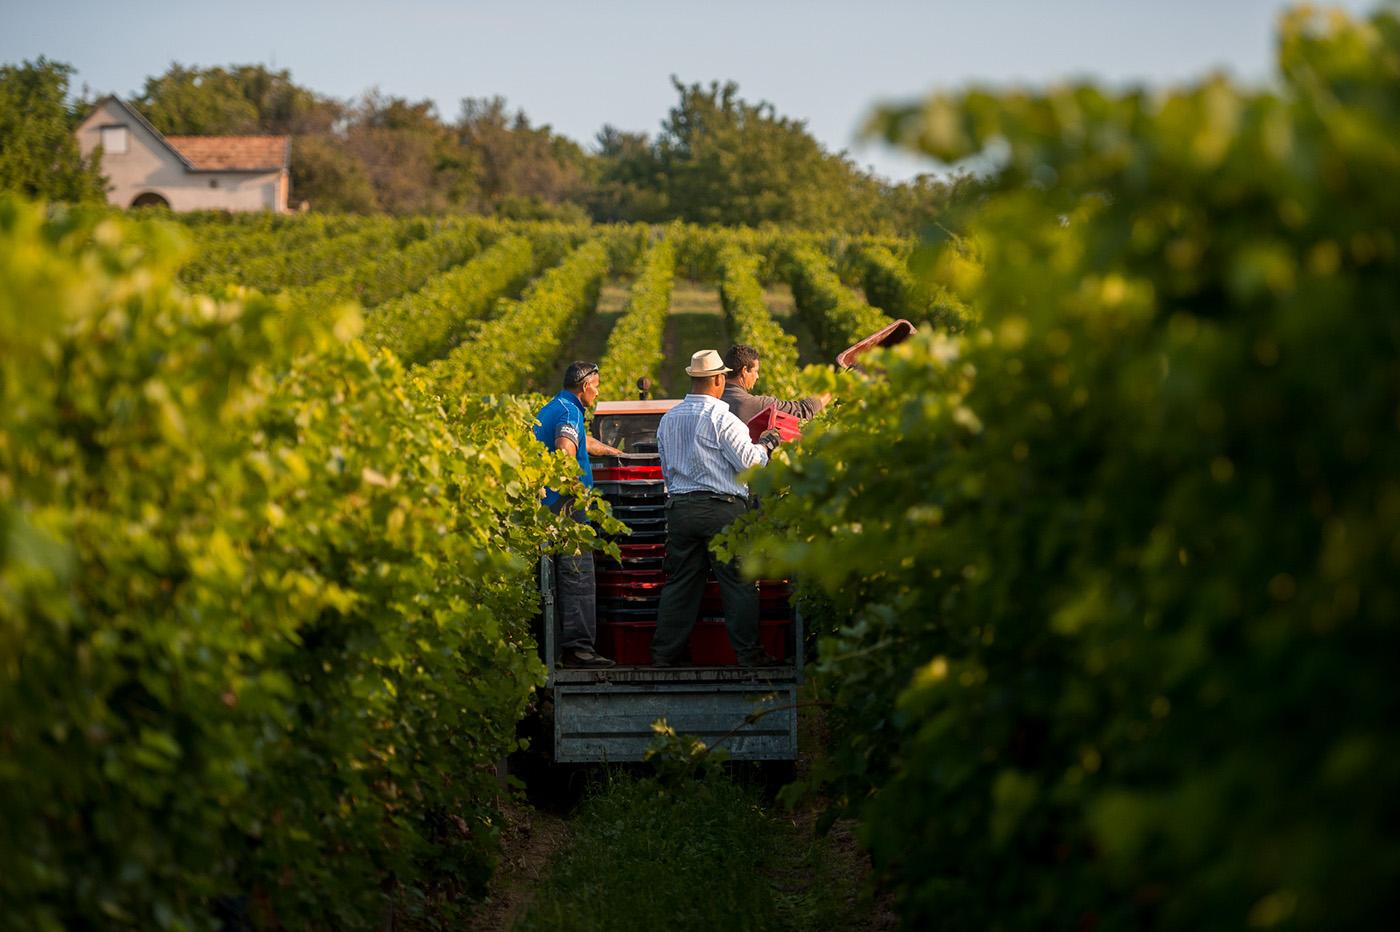 photoreport photo Photography  wine harvest vineyard grape field Work